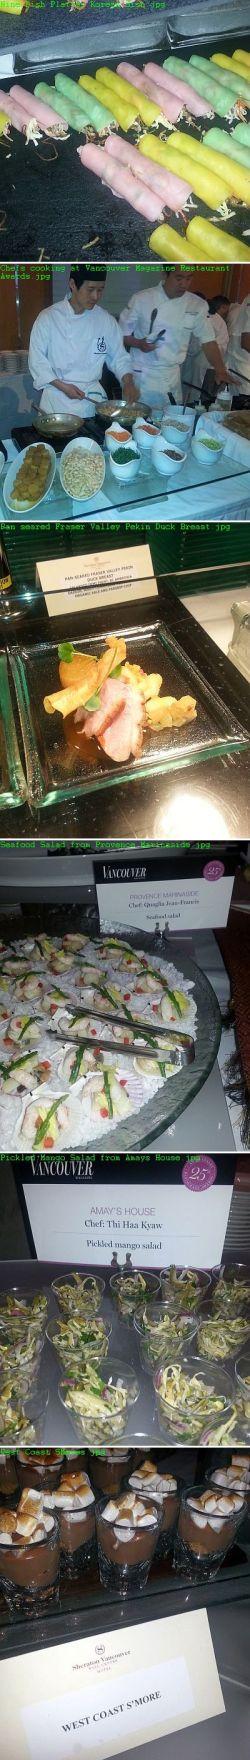 Vancouver Magazine Restaurant Awards Dishes Sampled